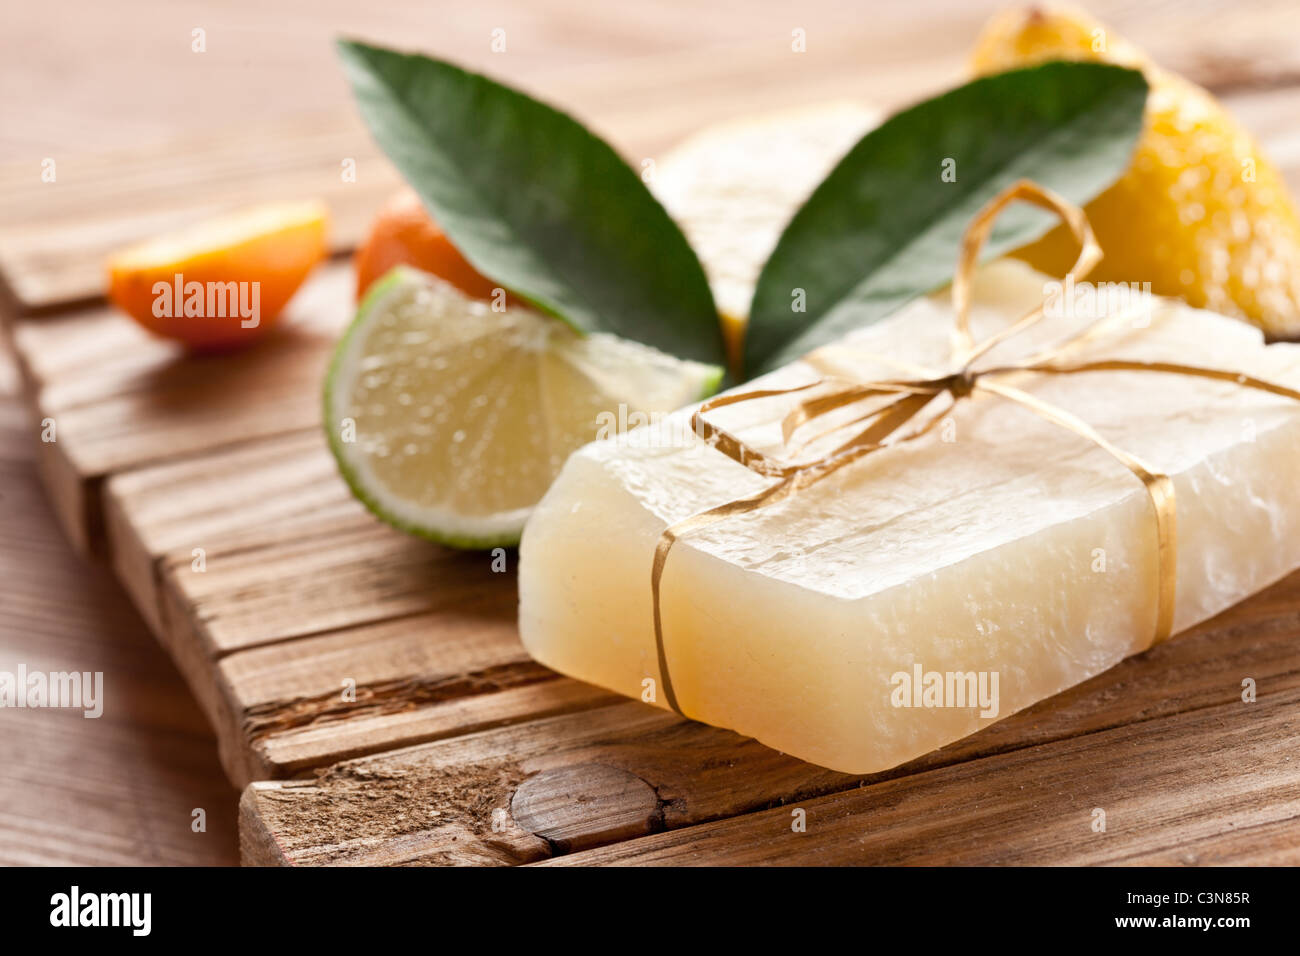 Piece of handmade lemon soap. - Stock Image